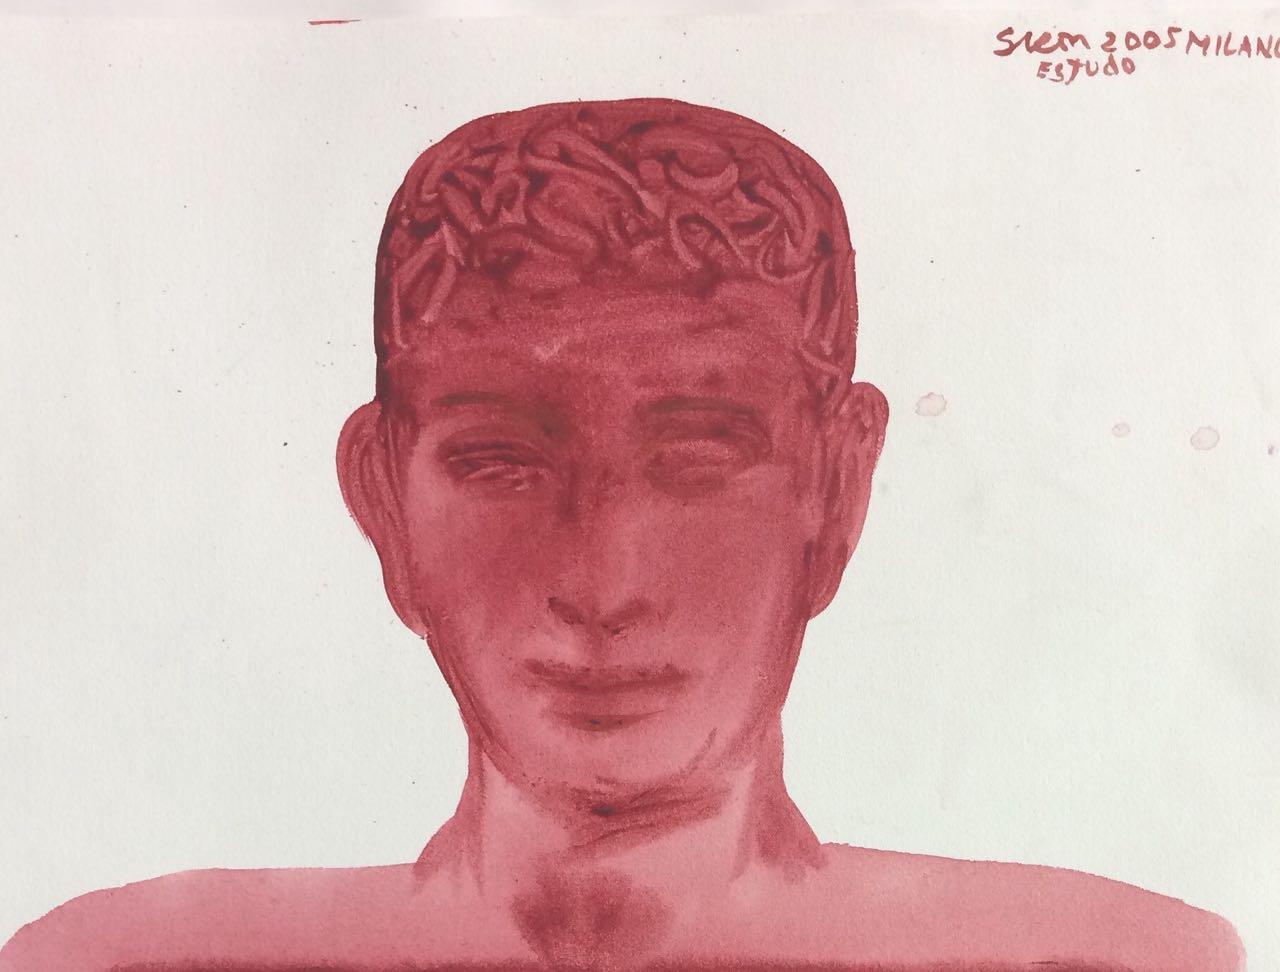 SF12 - Siron Franco - Milano [2005] - 03